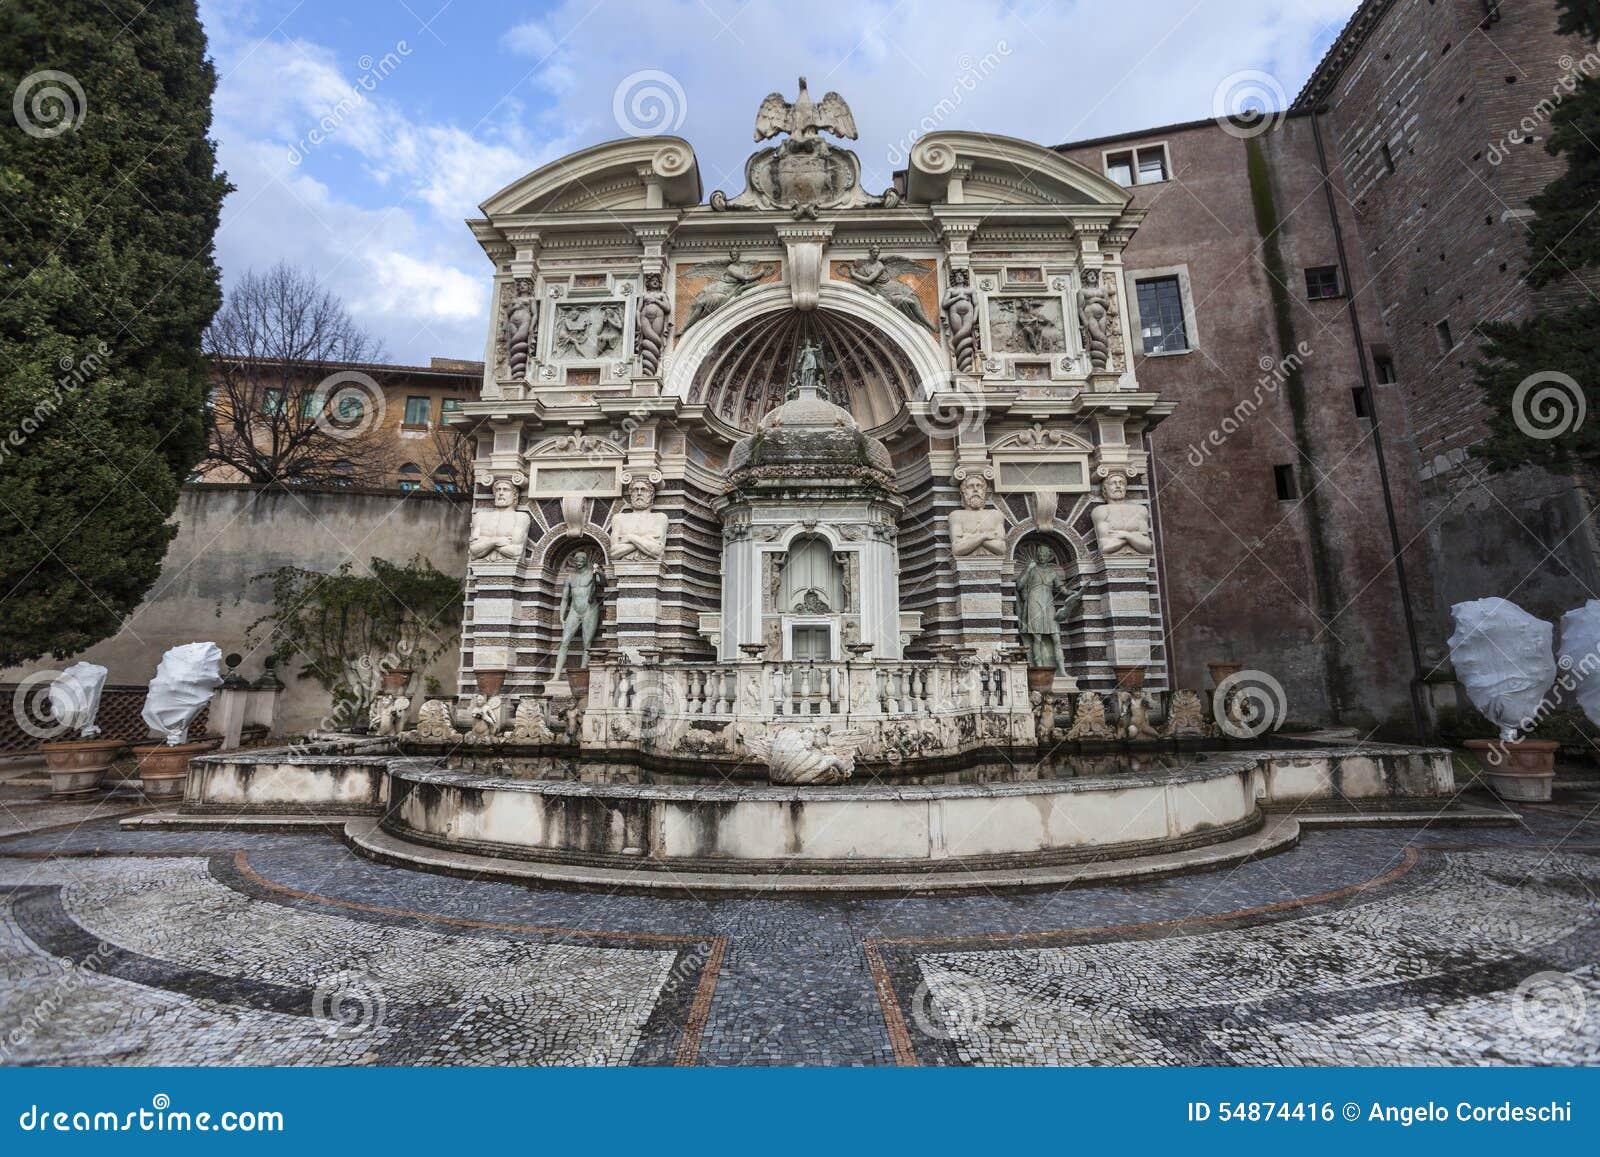 Villa DEste, Tivoli de fontaine d organe (dellOrgano de Fontana) l Italie